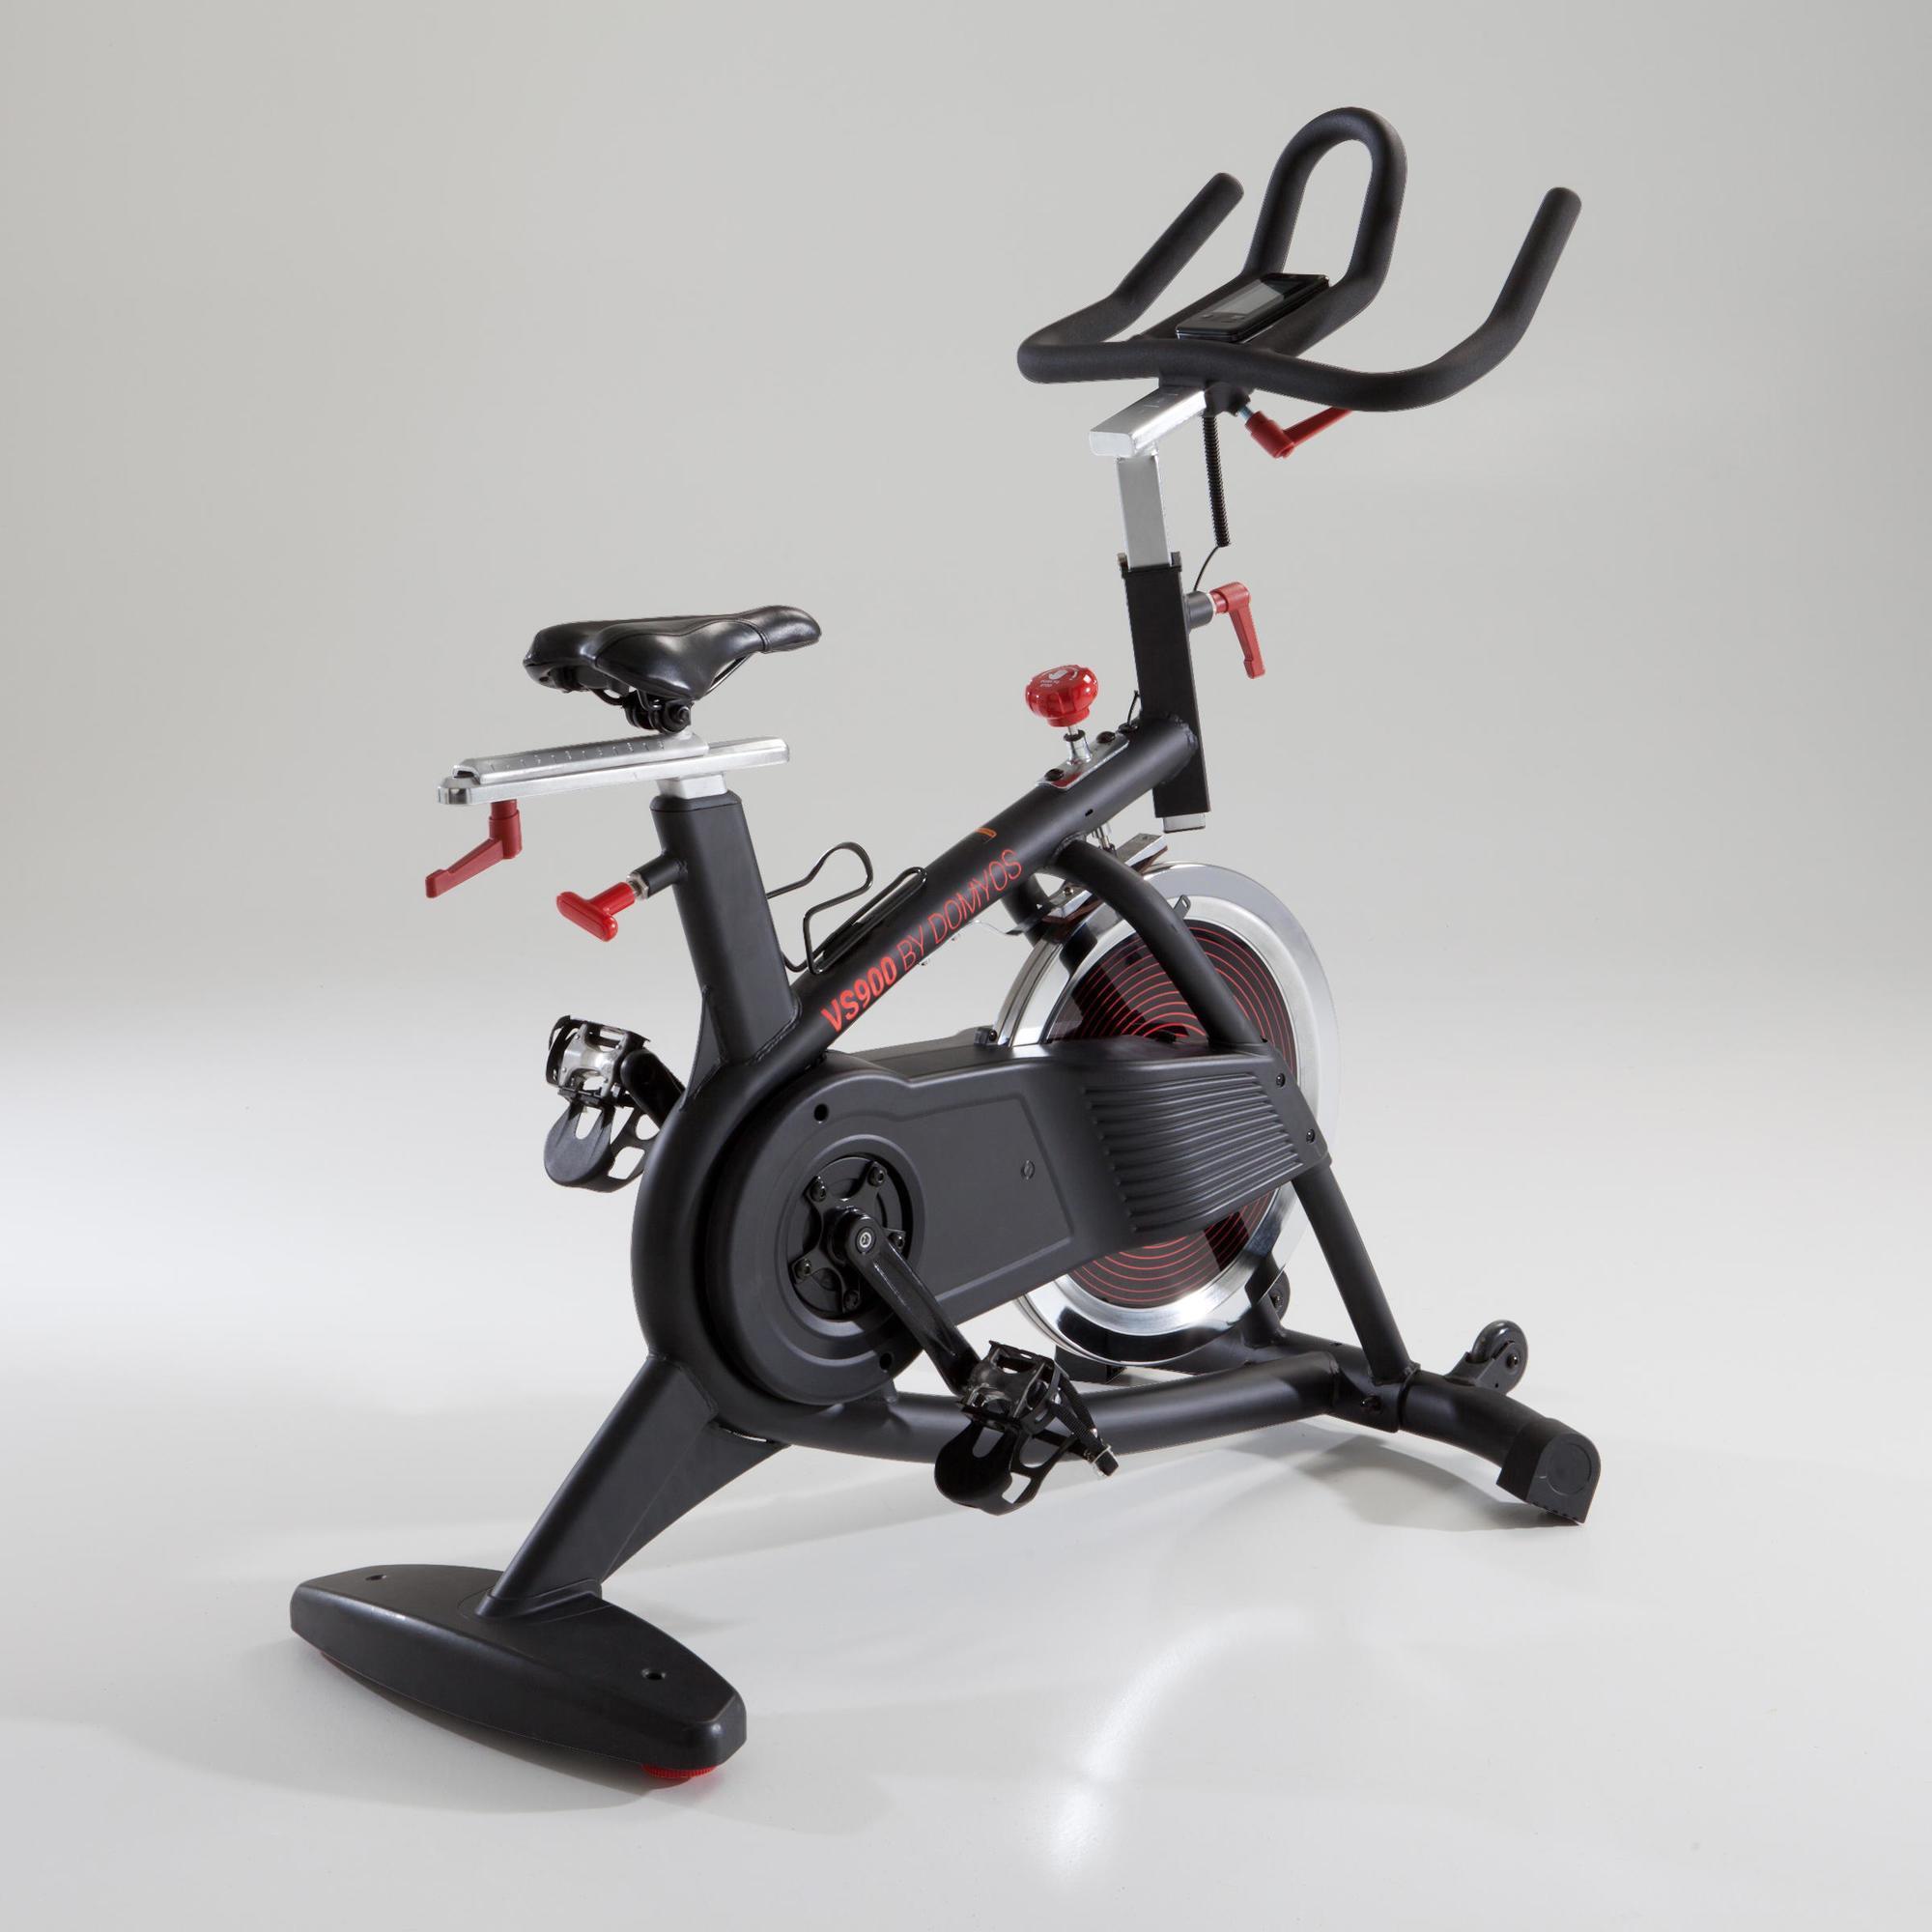 vs900 indoor bike domyos by decathlon. Black Bedroom Furniture Sets. Home Design Ideas